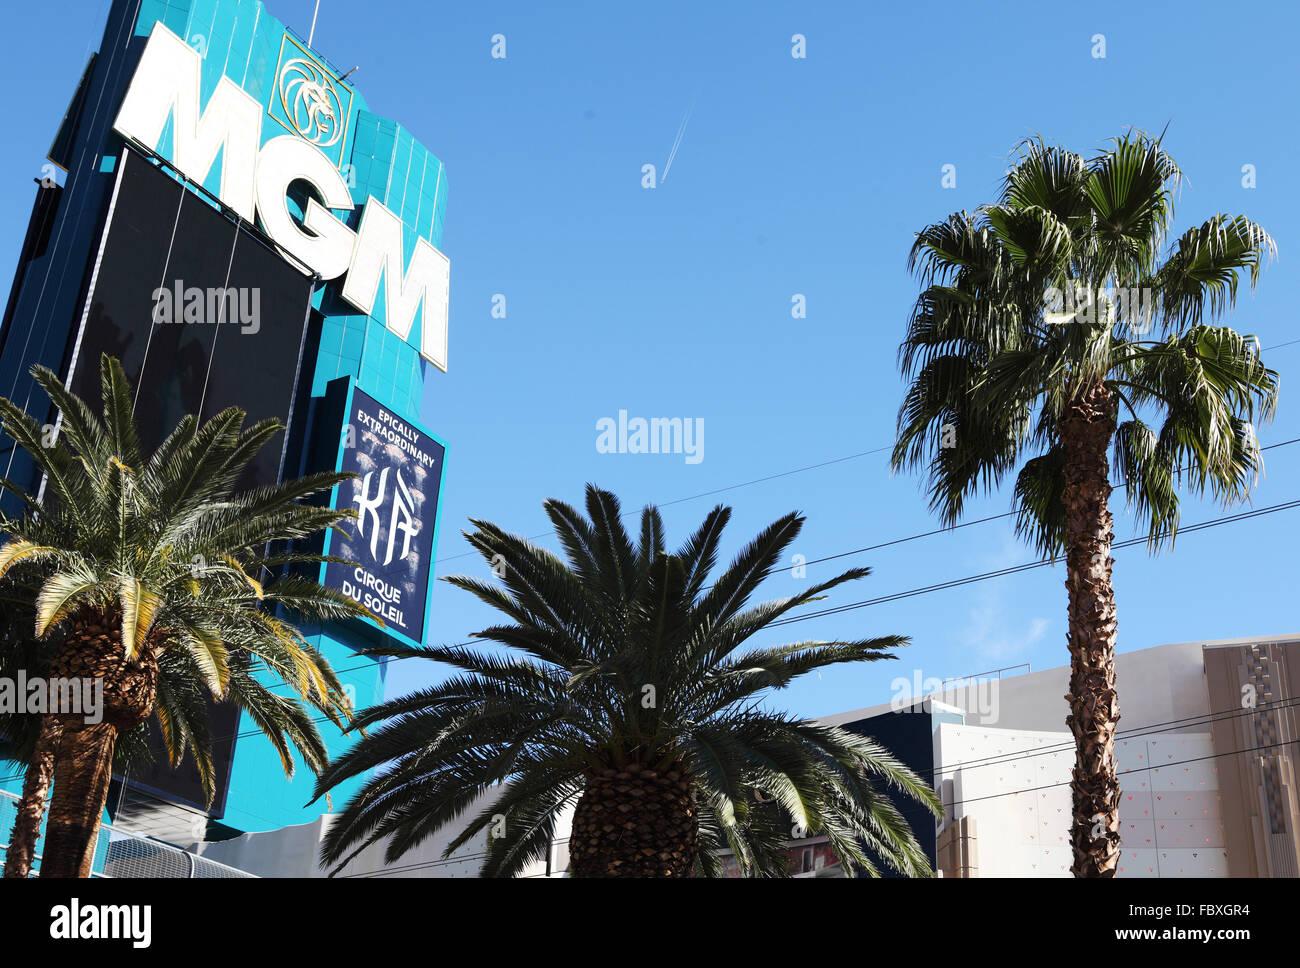 mgm casino sign - Stock Image